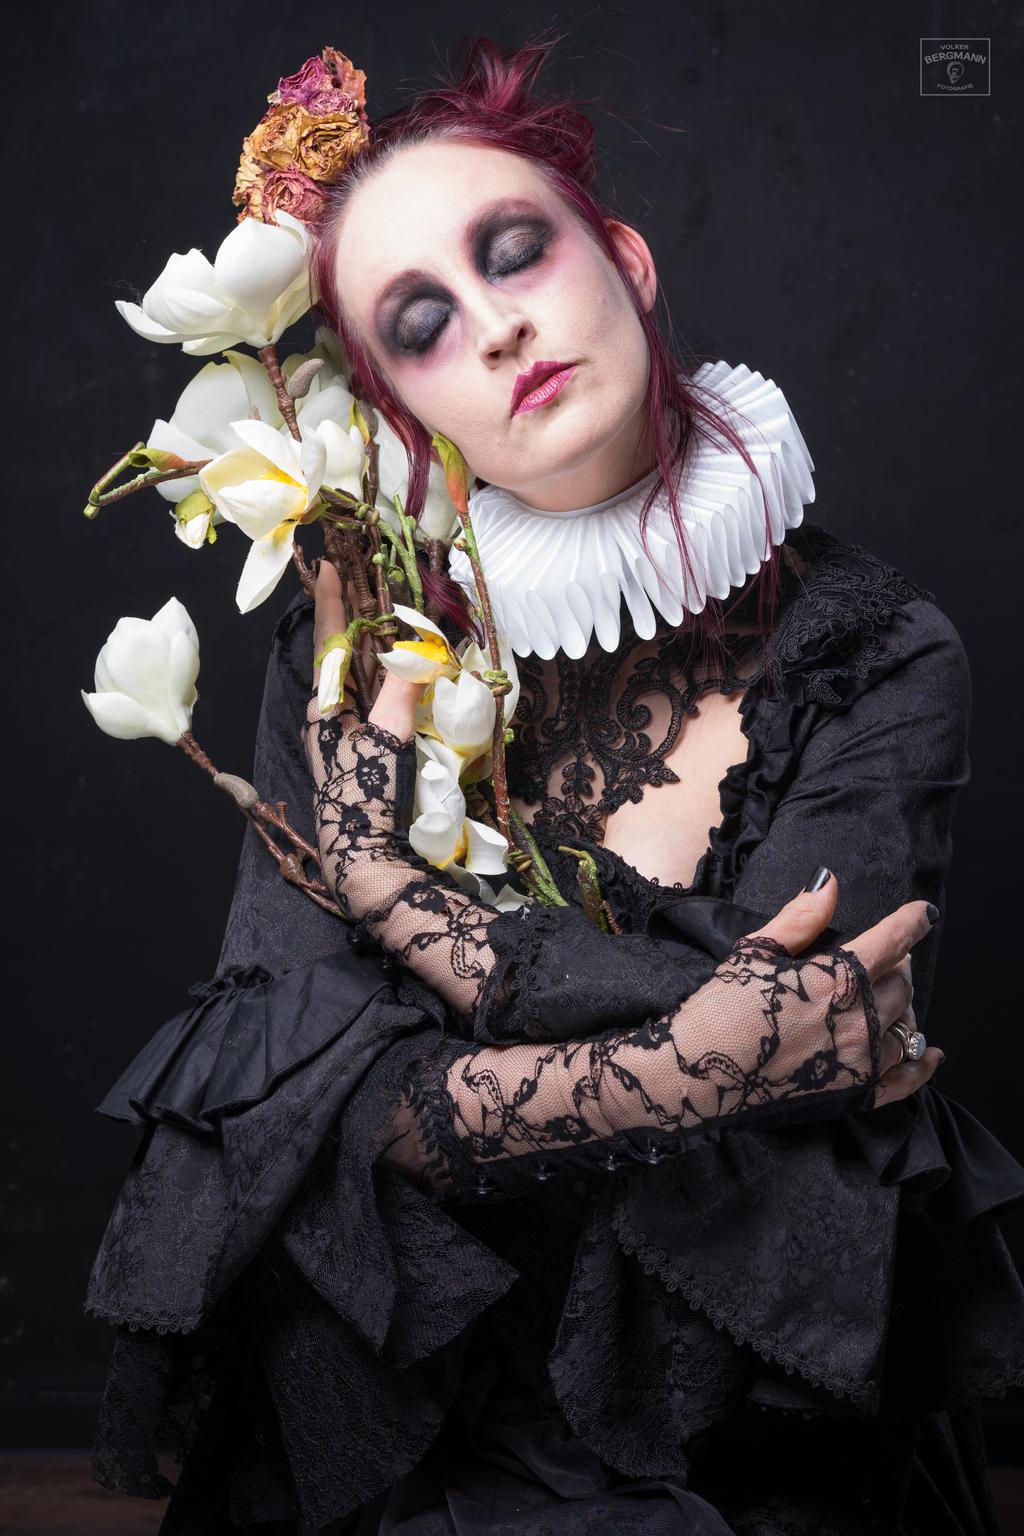 Stock - Strange flower .. gothic portrait dreams